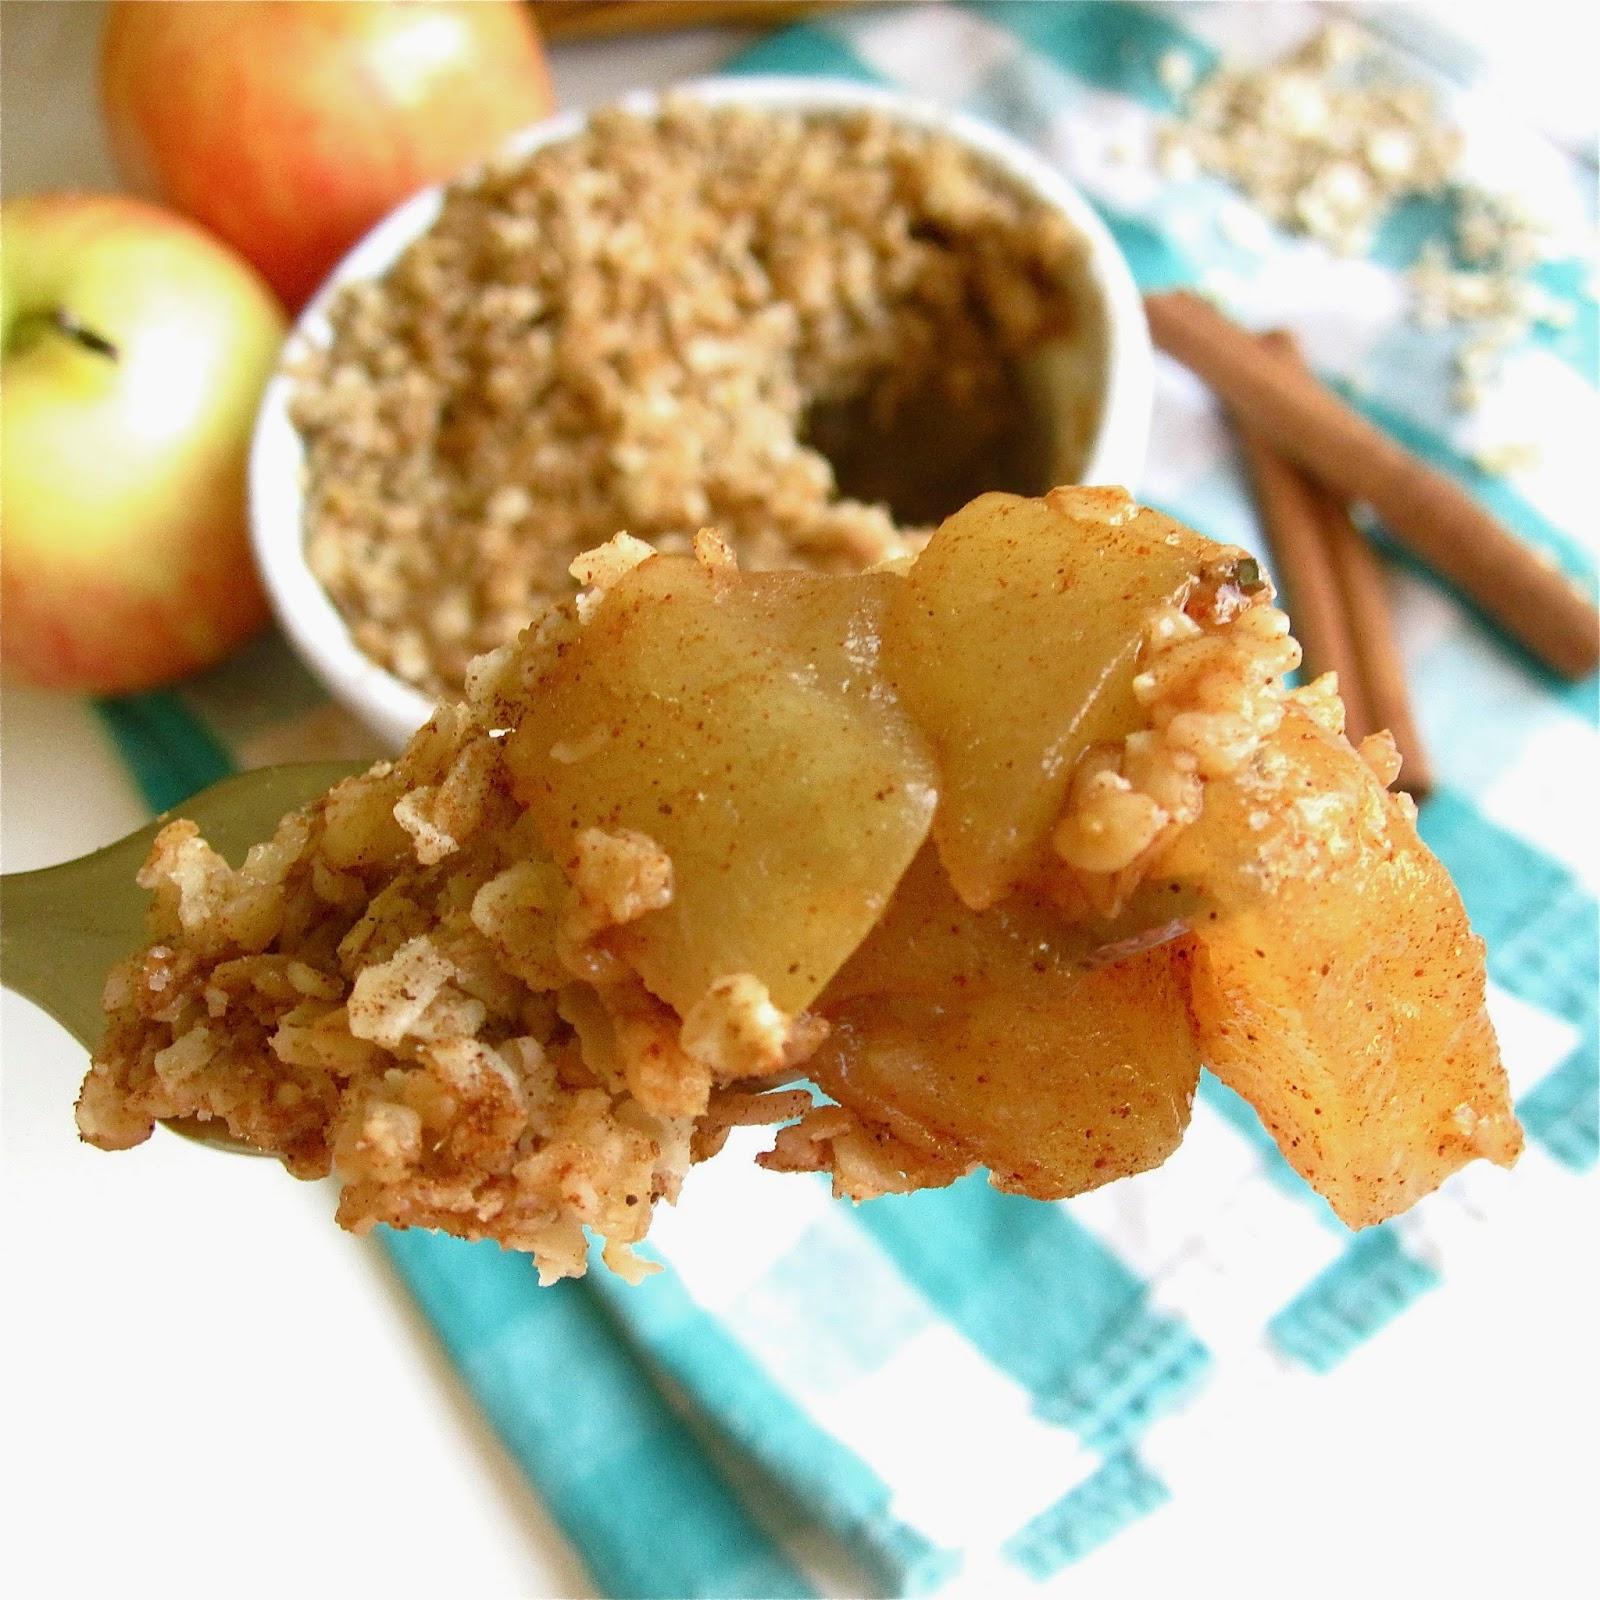 http://blog.dollhousebakeshoppe.com/2014/09/healthy-5-minute-single-serving-apple.html